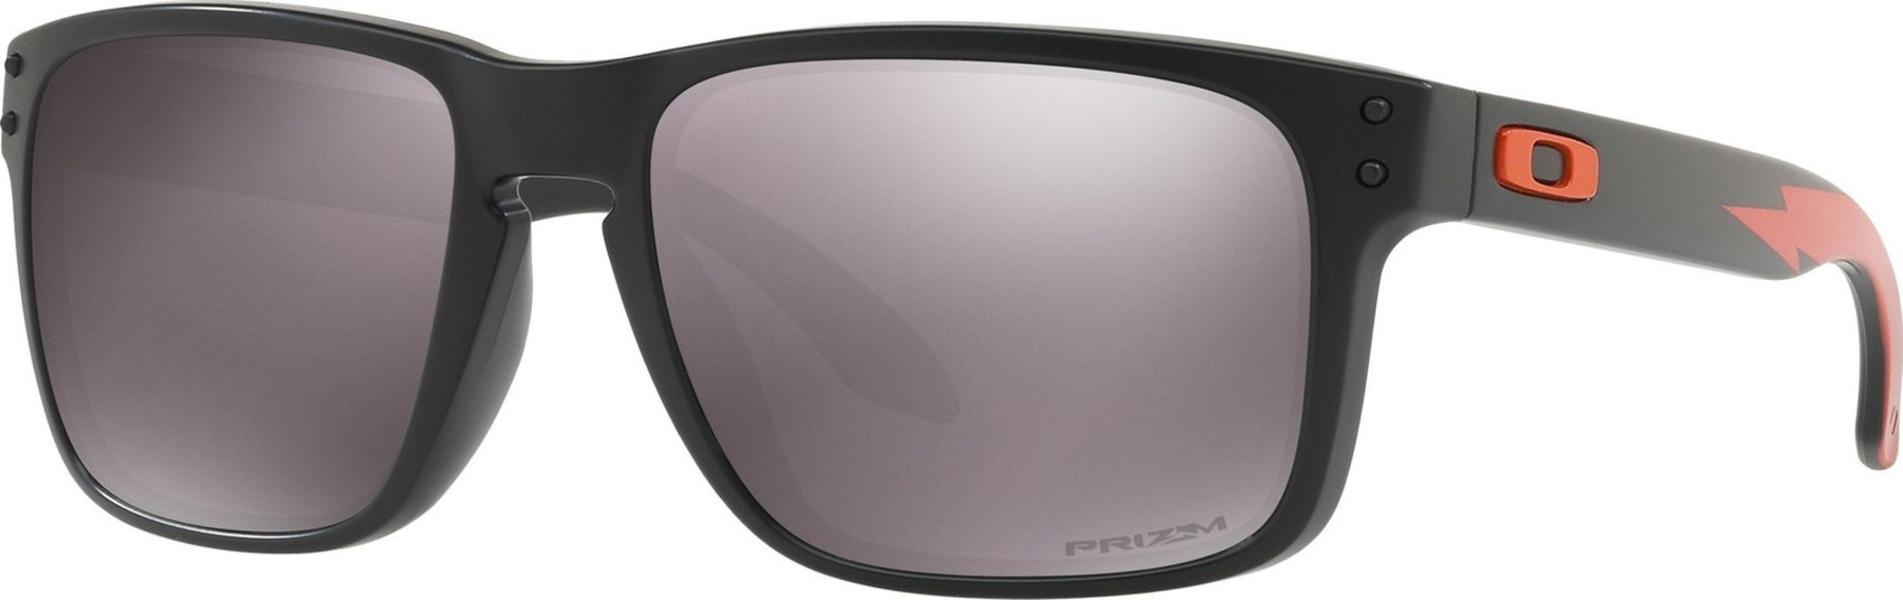 04b91917da Oakley Holbrook Sunglasses Apocalypse Surf Prizm Daily Polarized ...